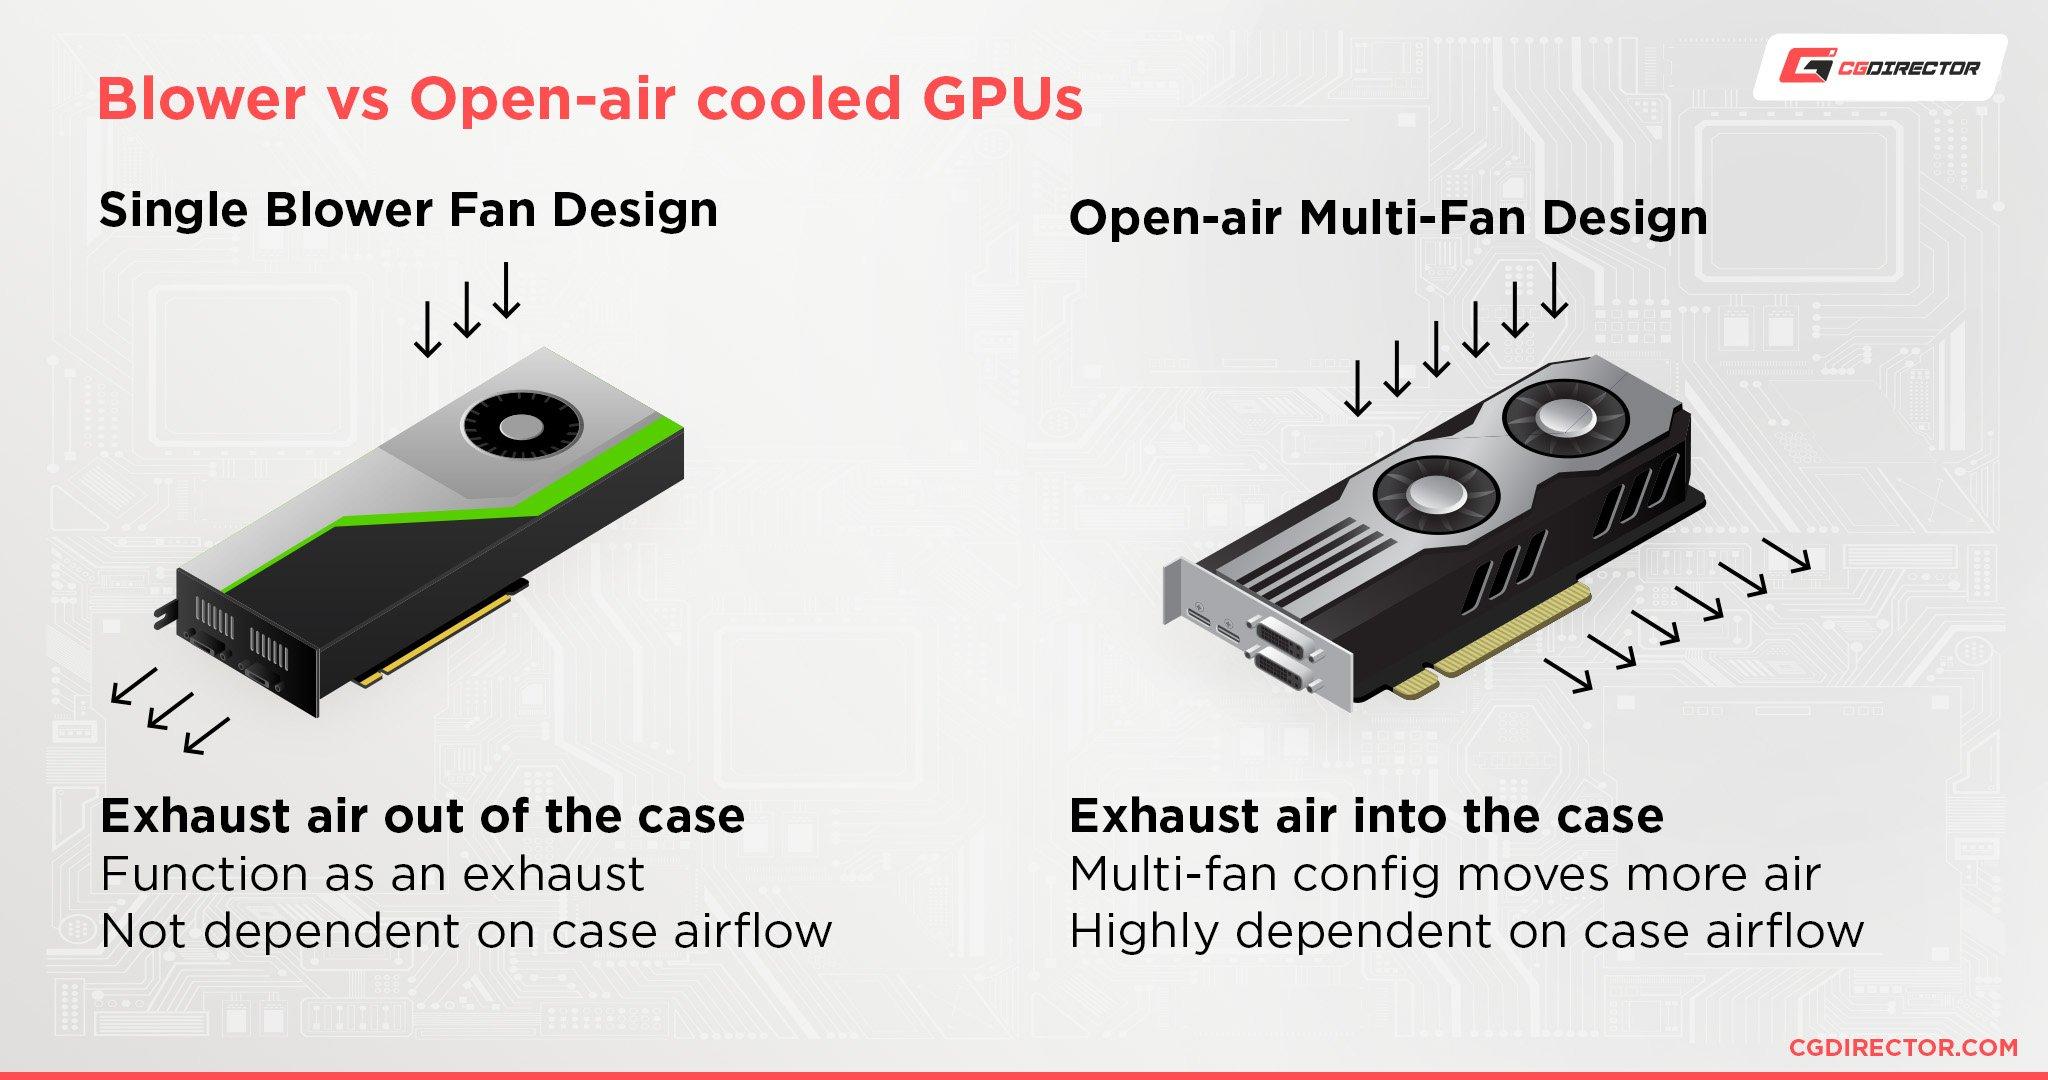 Blower style vs open-air GPU